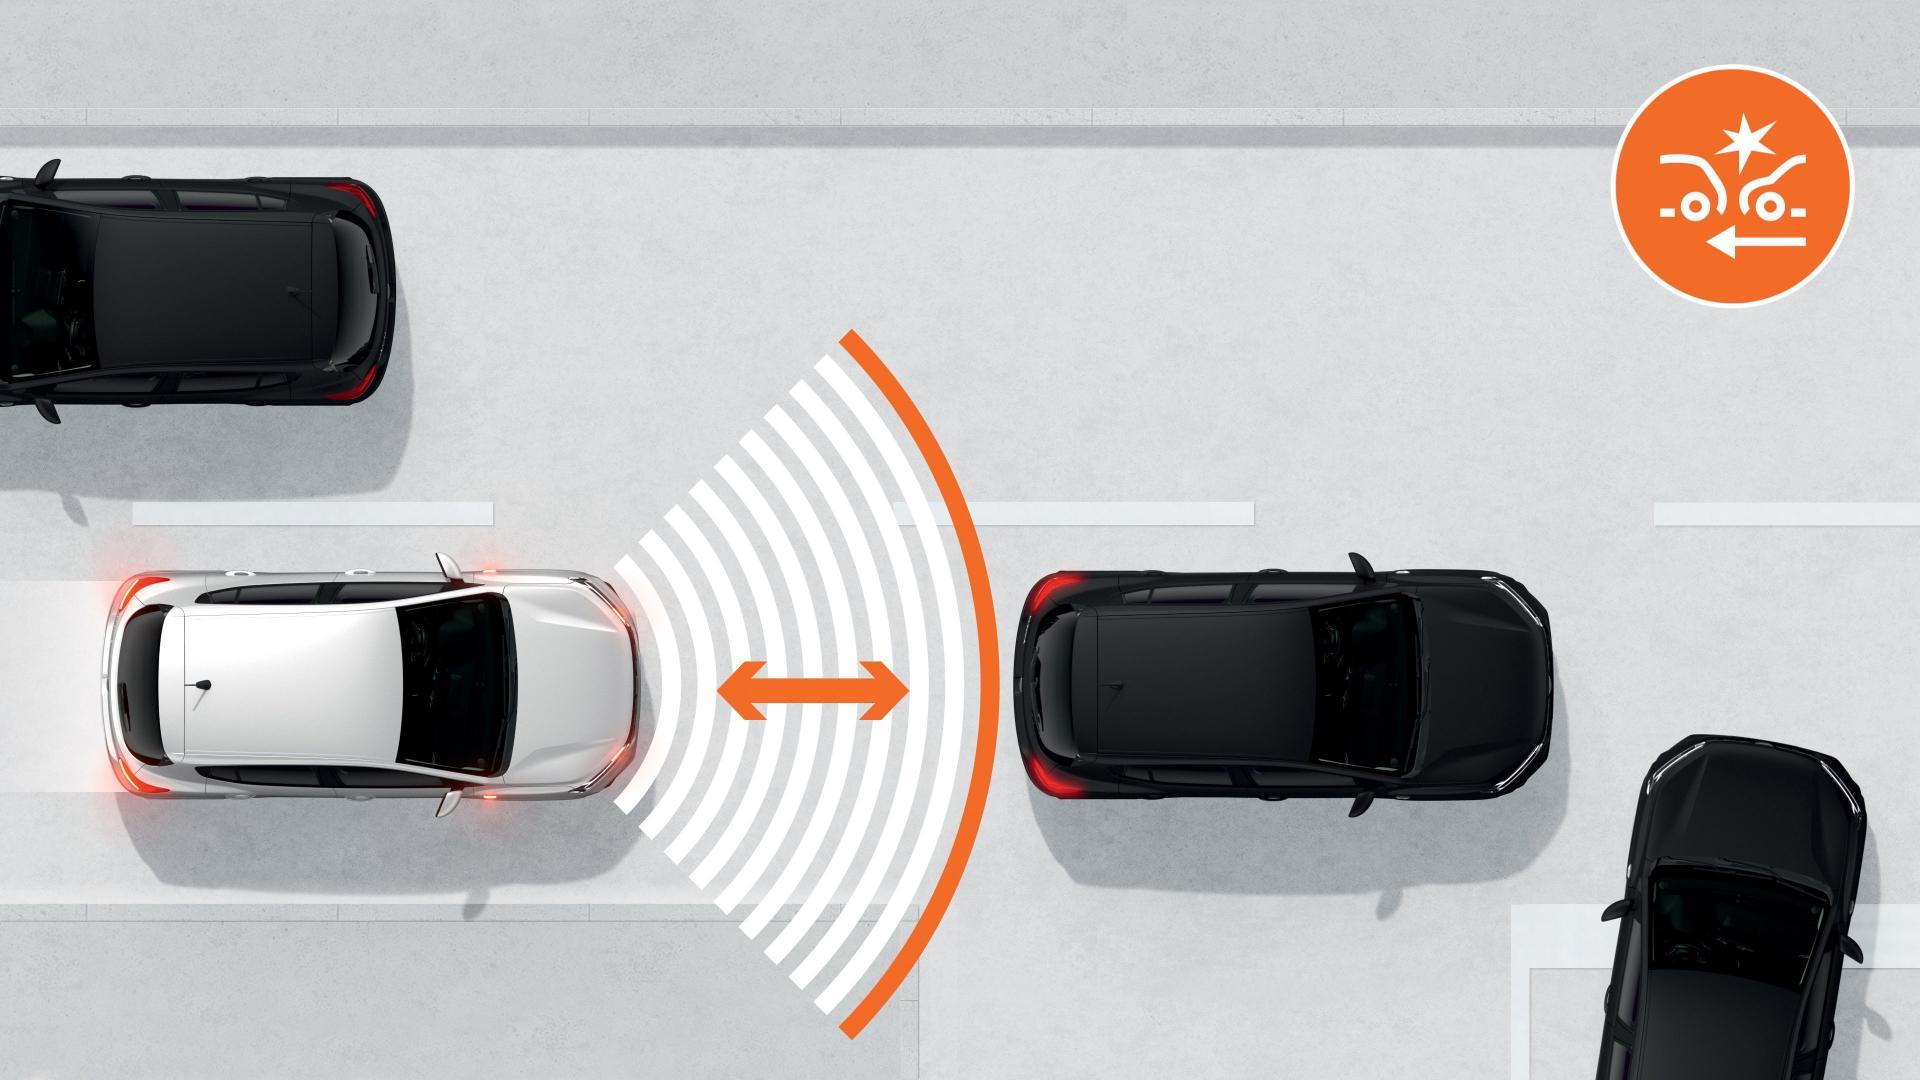 Der aktive Notfall-Bremsassistent des Dacia SANDERO Autohaus Schouren